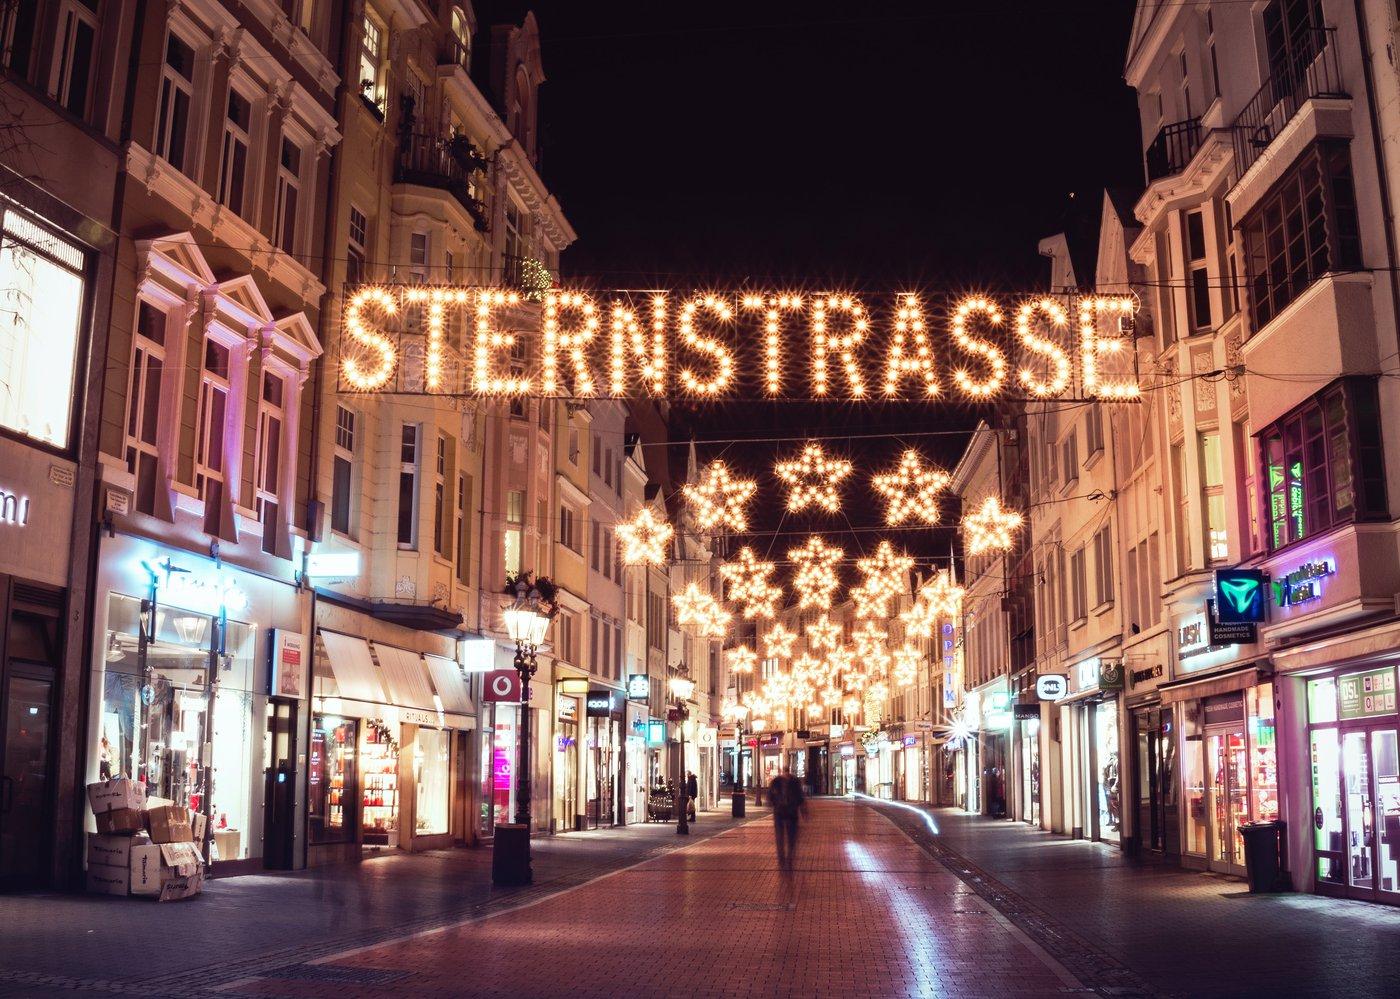 Sternstrasse, Bonn